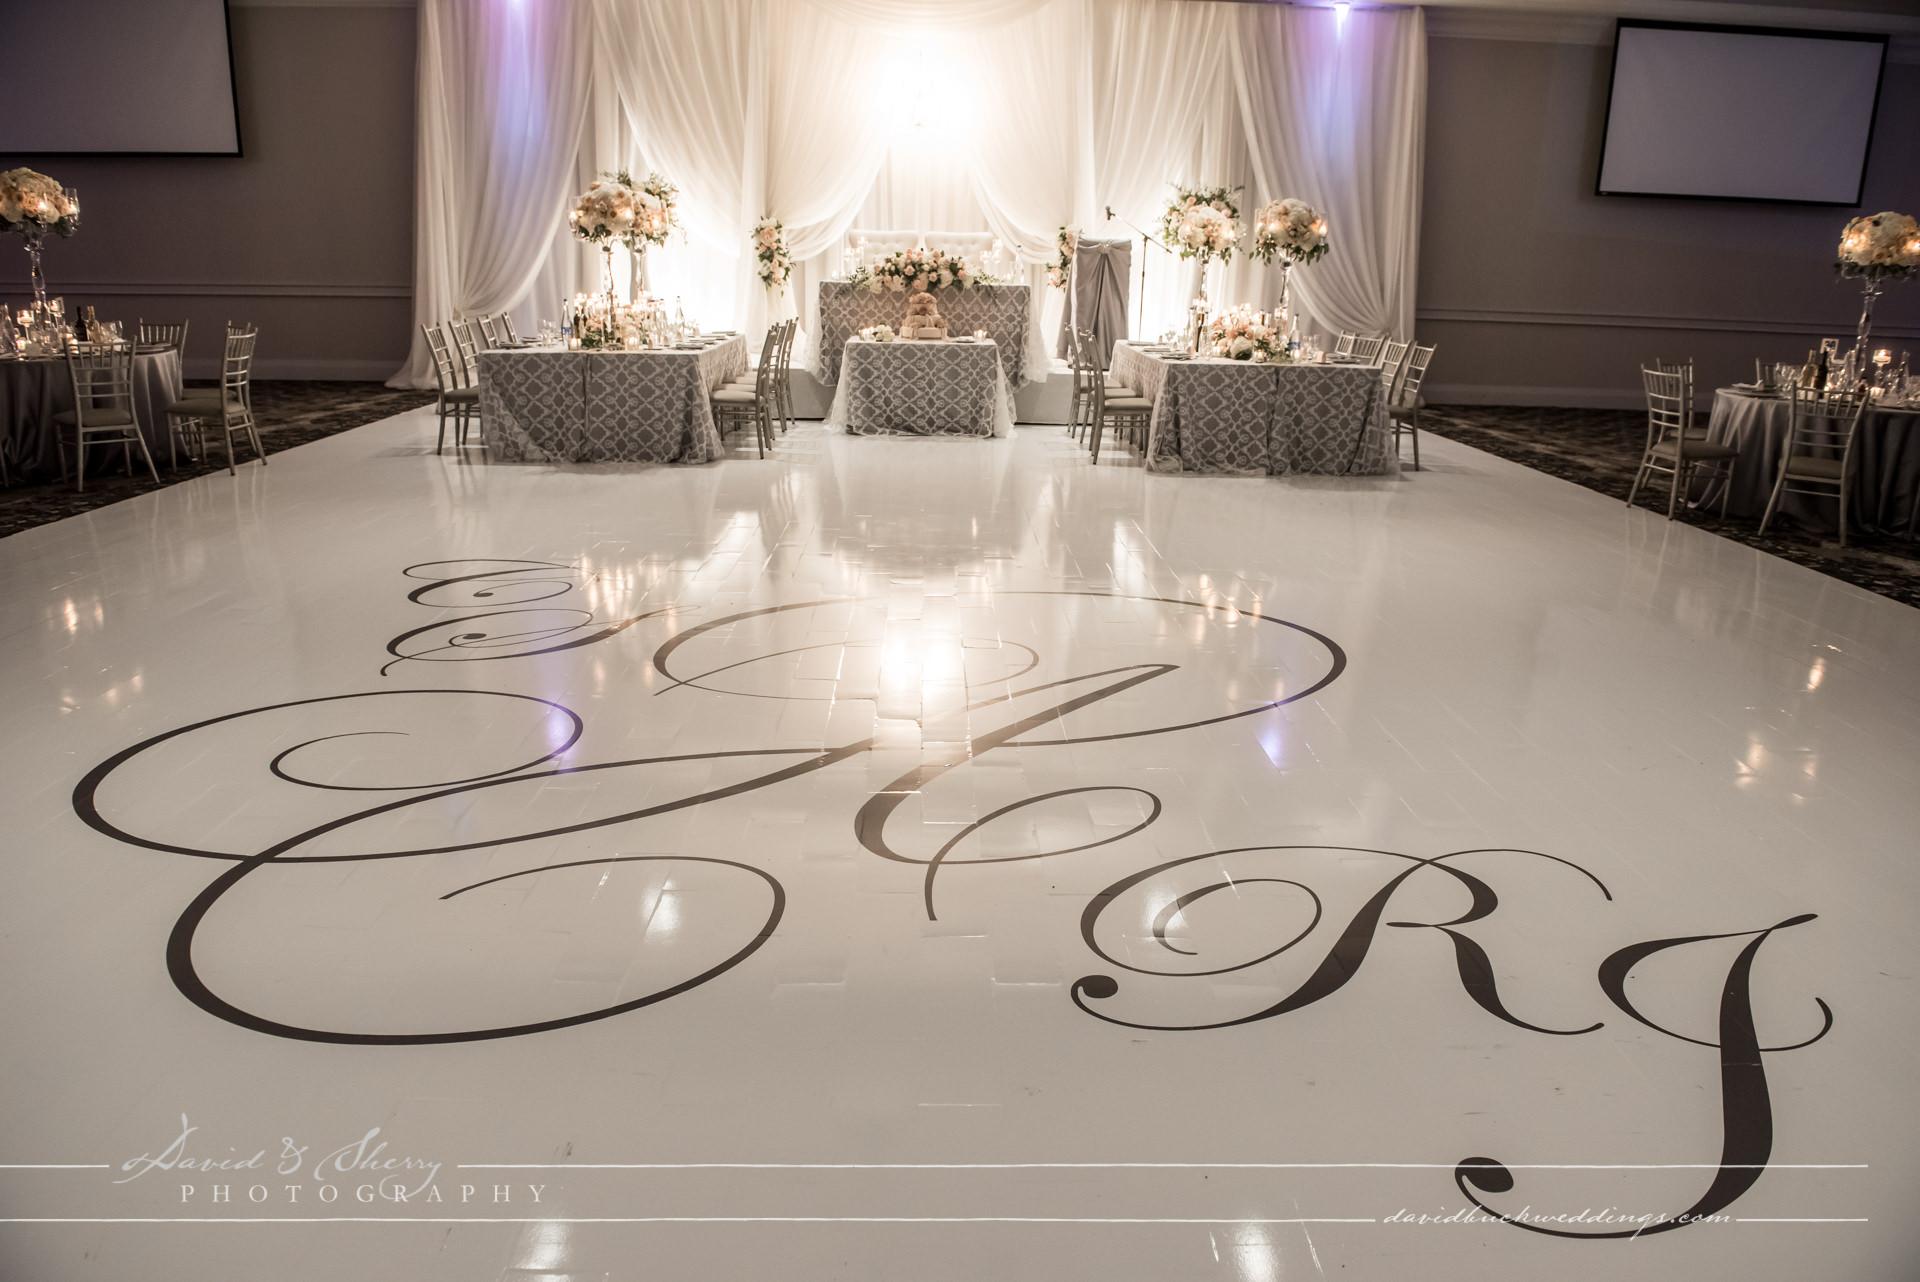 Parkview Manor custom dance floor covering